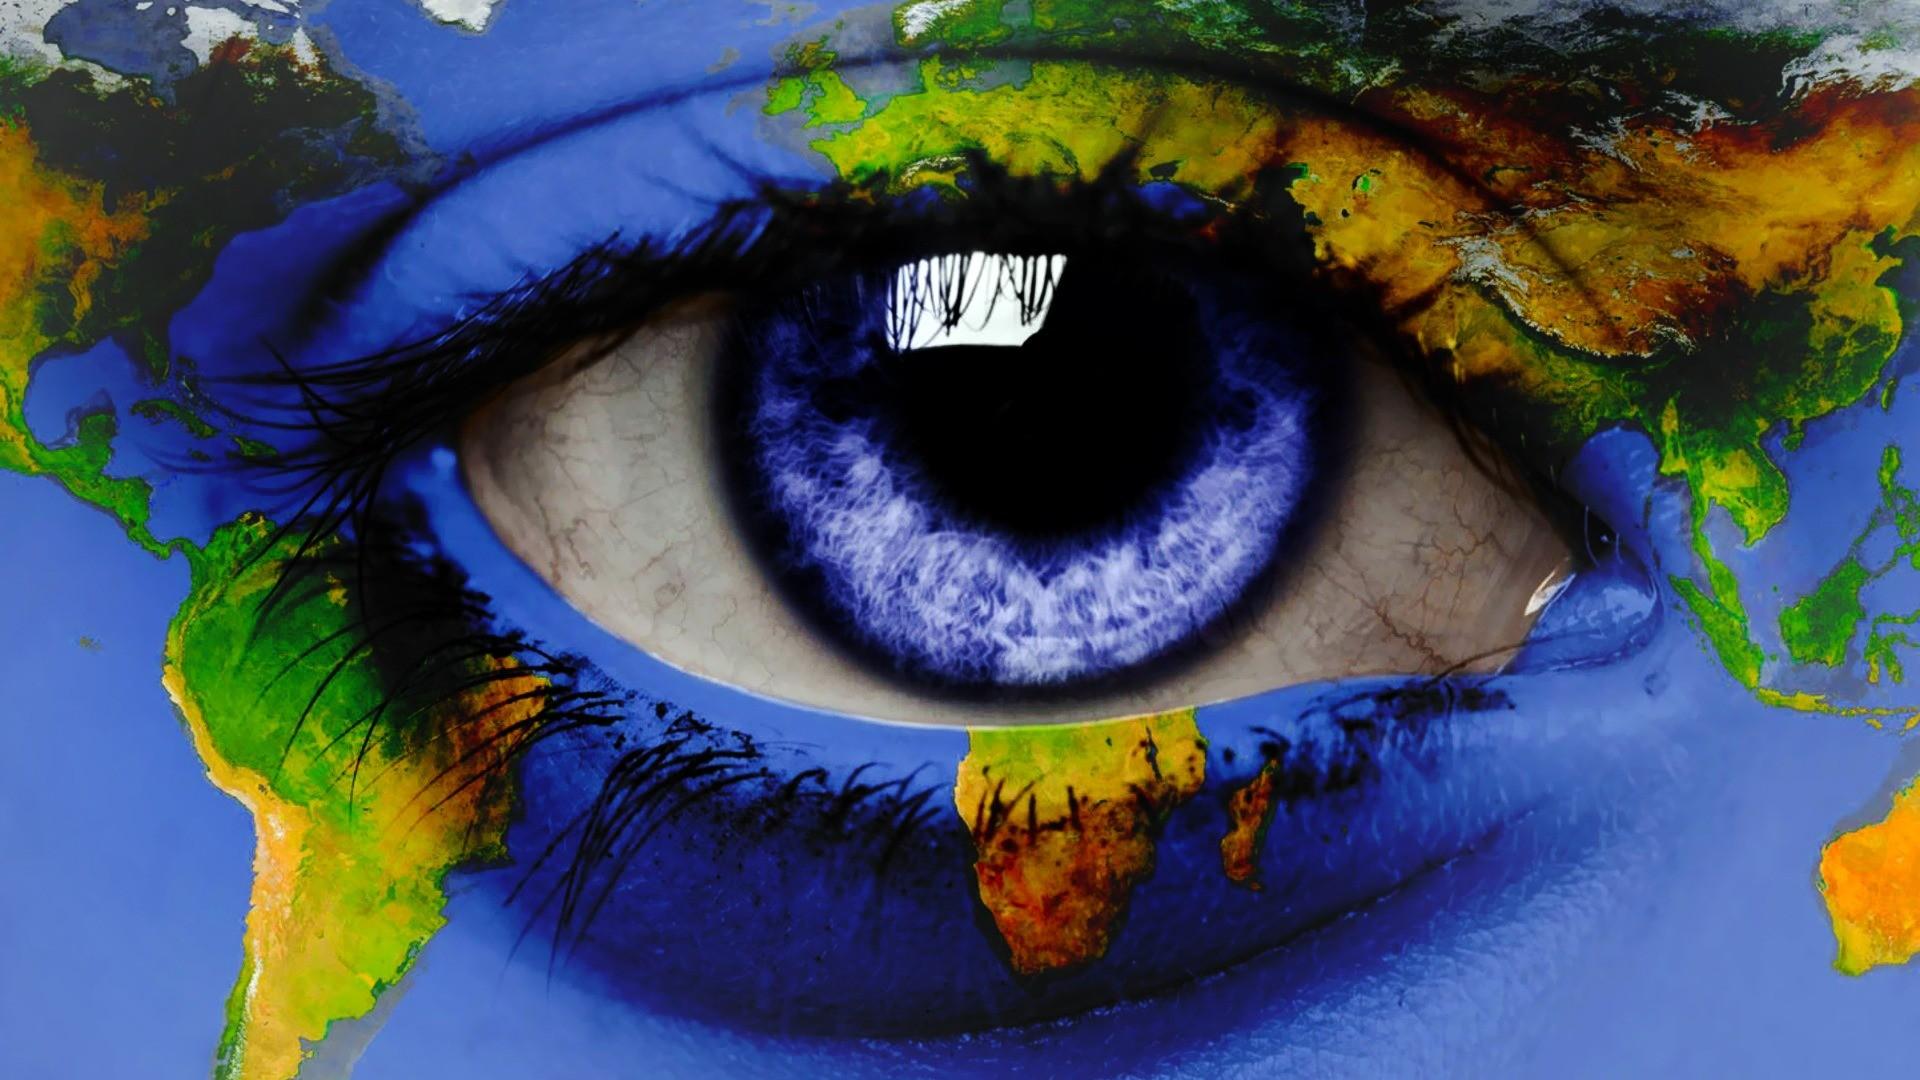 Girl Face Wallpaper 5k Close Up Eyes Blue Eyes World Map Eye Wallpaper